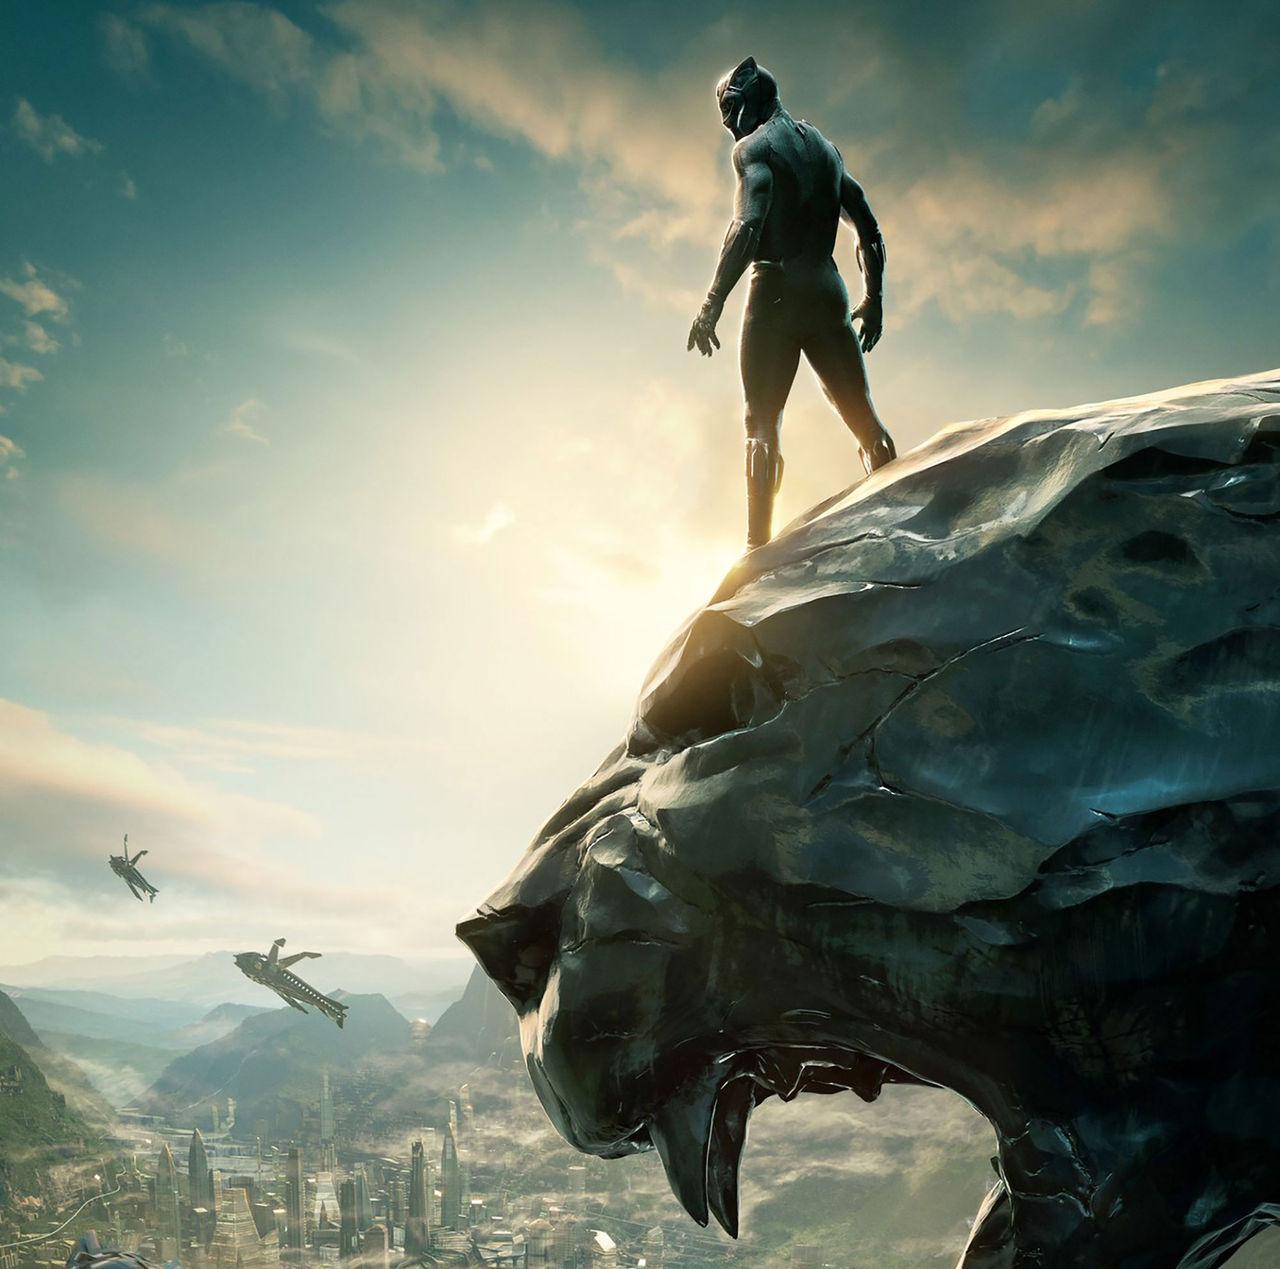 Nu har Black Panther spelat in över 1 miljard dollar